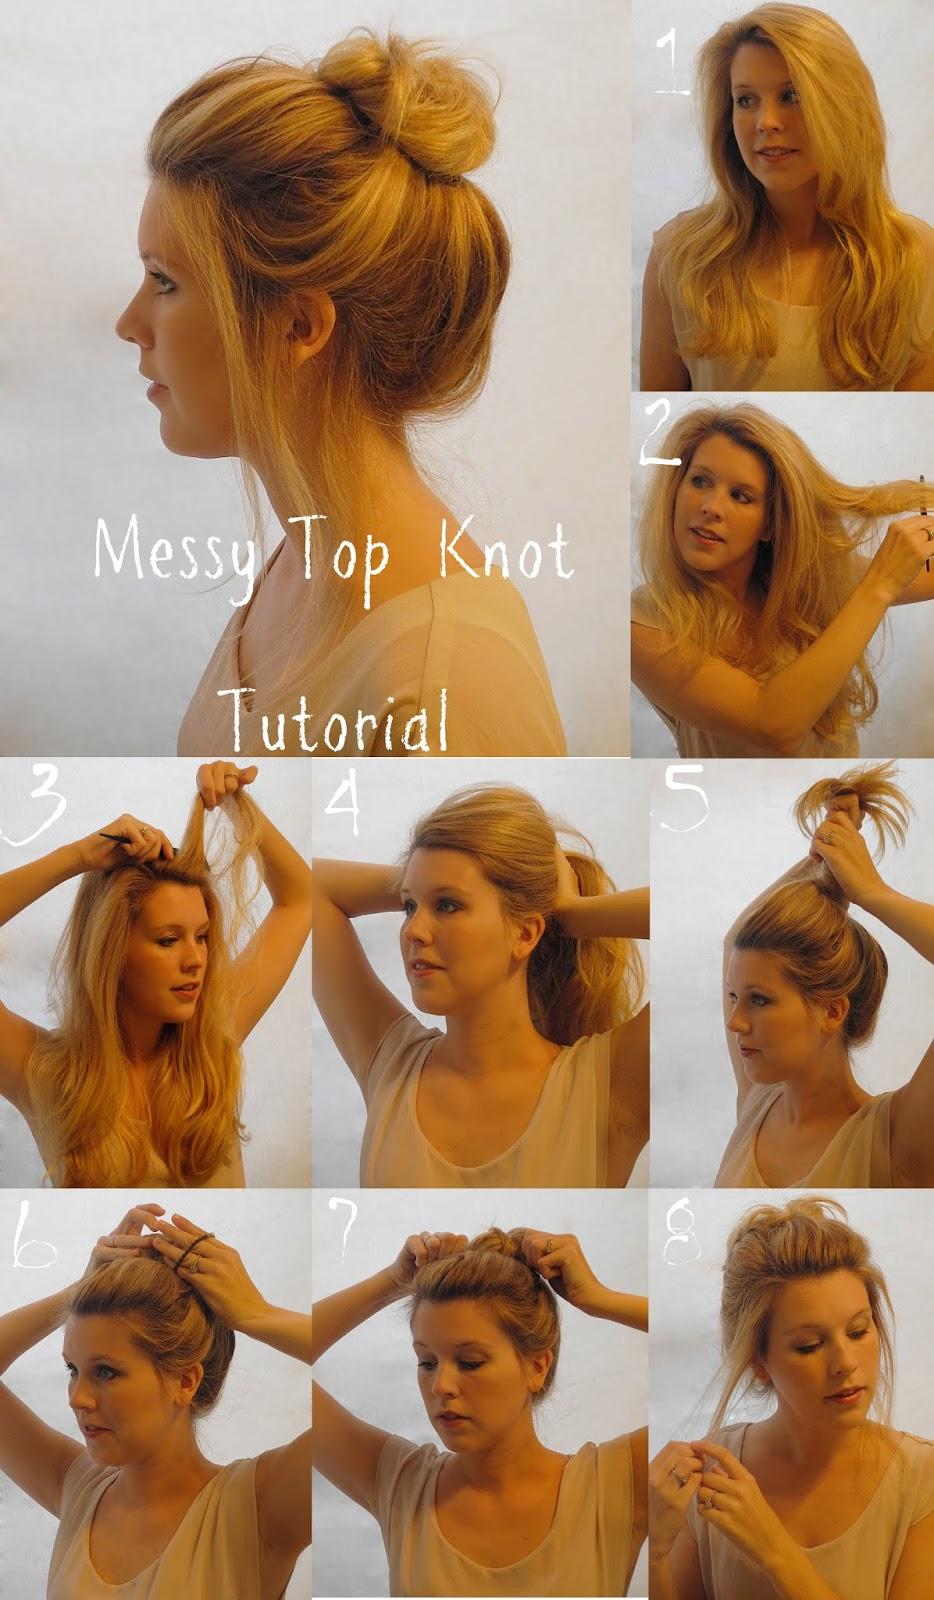 Enjoyable Top 25 Messy Hair Bun Tutorials Perfect For Those Lazy Mornings Short Hairstyles Gunalazisus